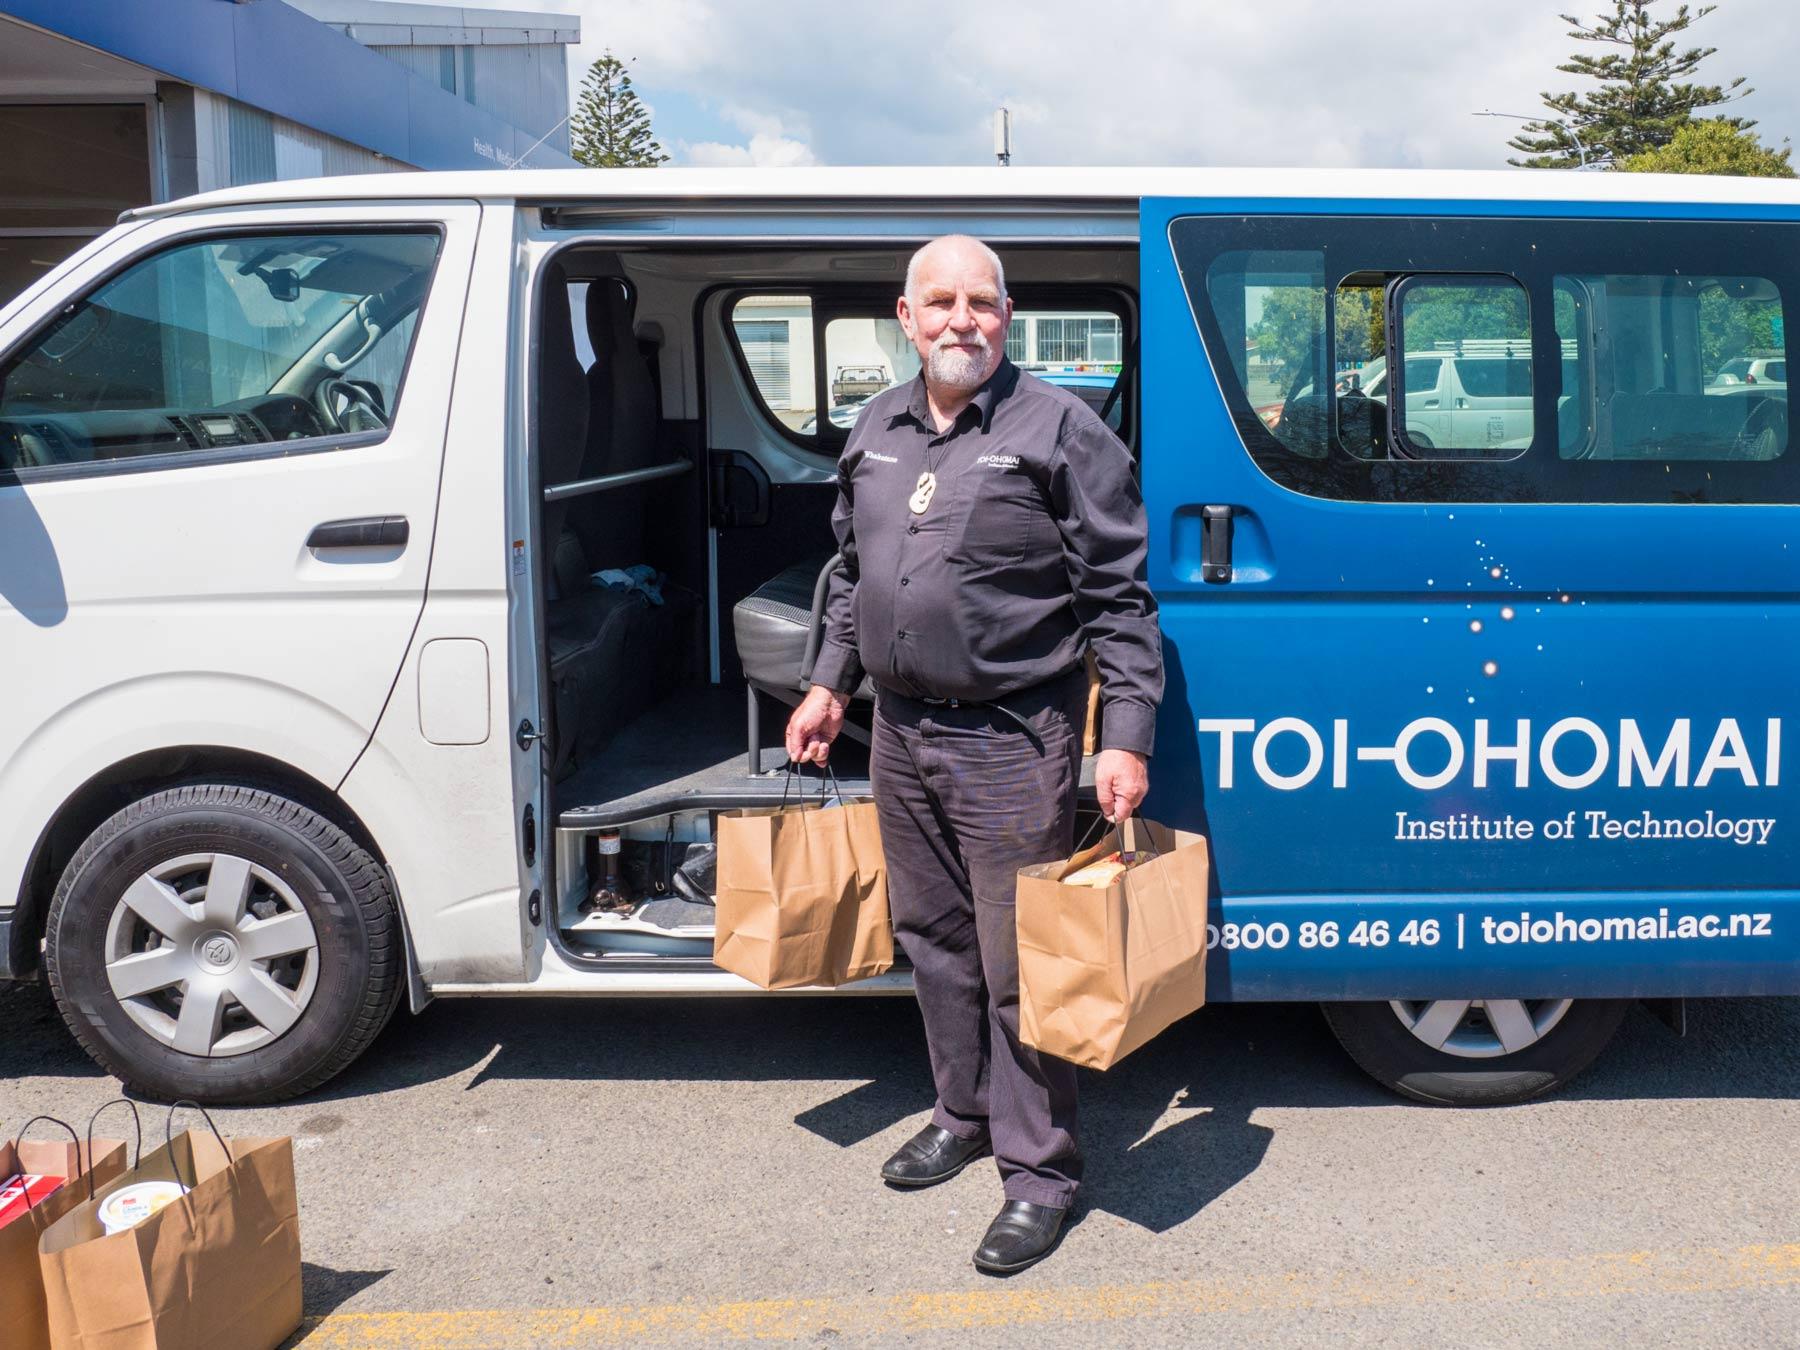 The Toi Ohomai van delivers food parcels